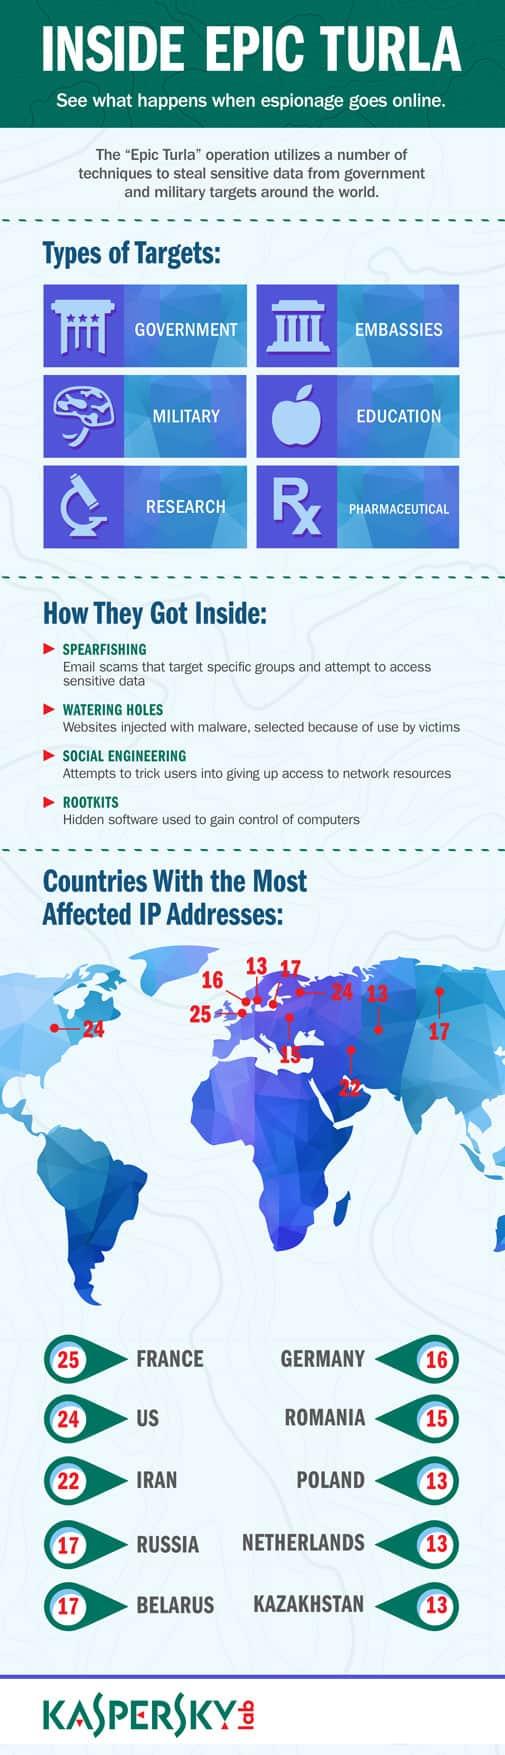 Infographic: Epic Turla - When Espionage Goes Online